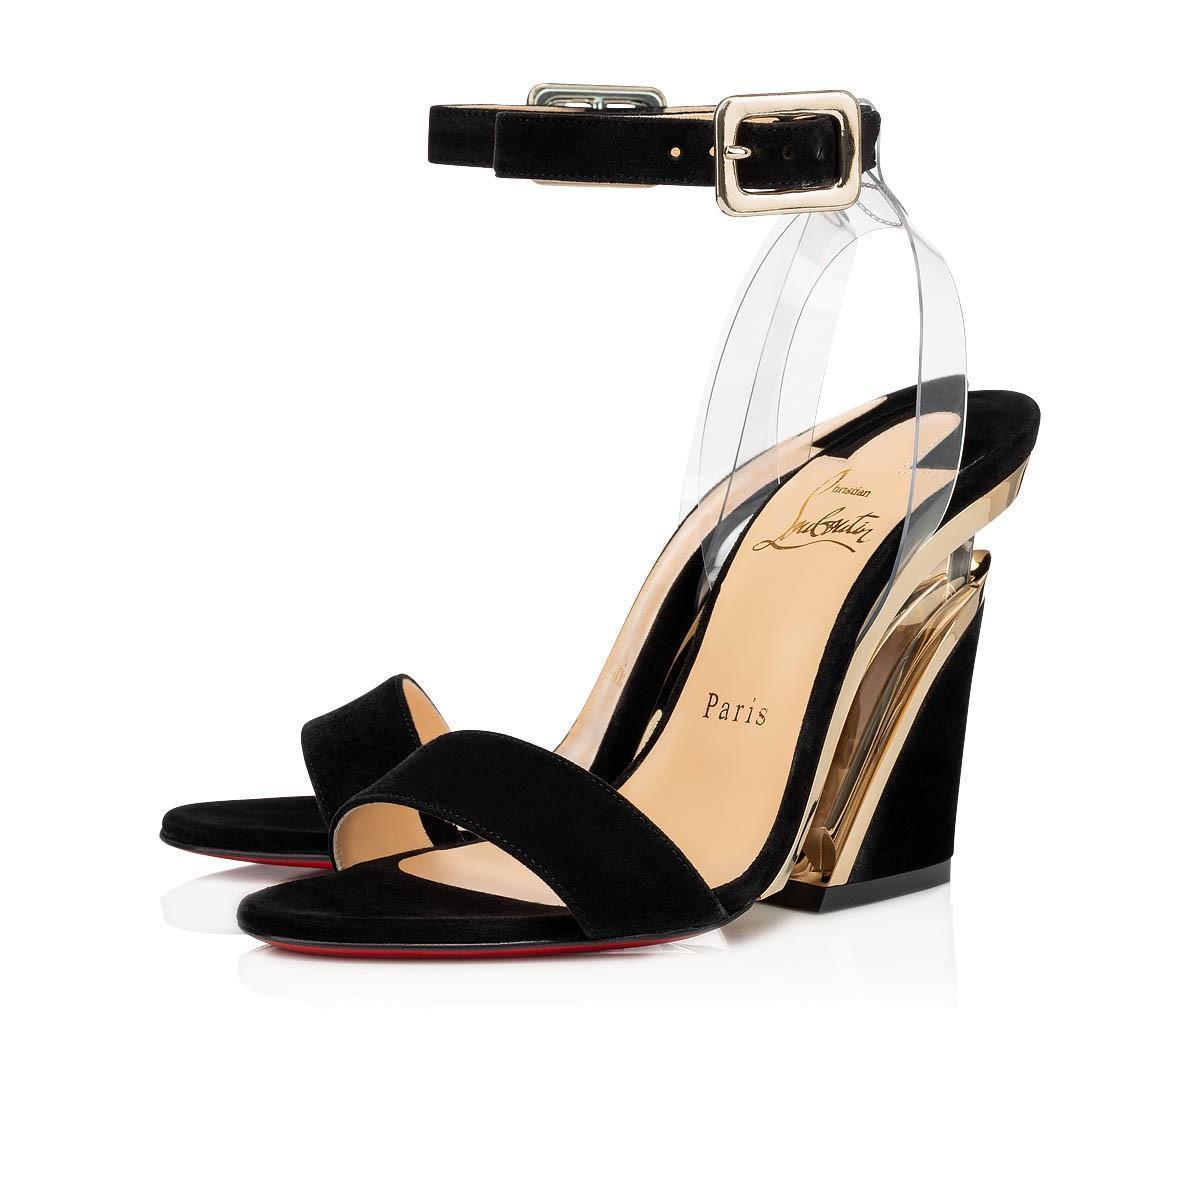 Levitalo露趾繫帶高跟涼鞋。NT$32,700。(Christian Louboutin提供)